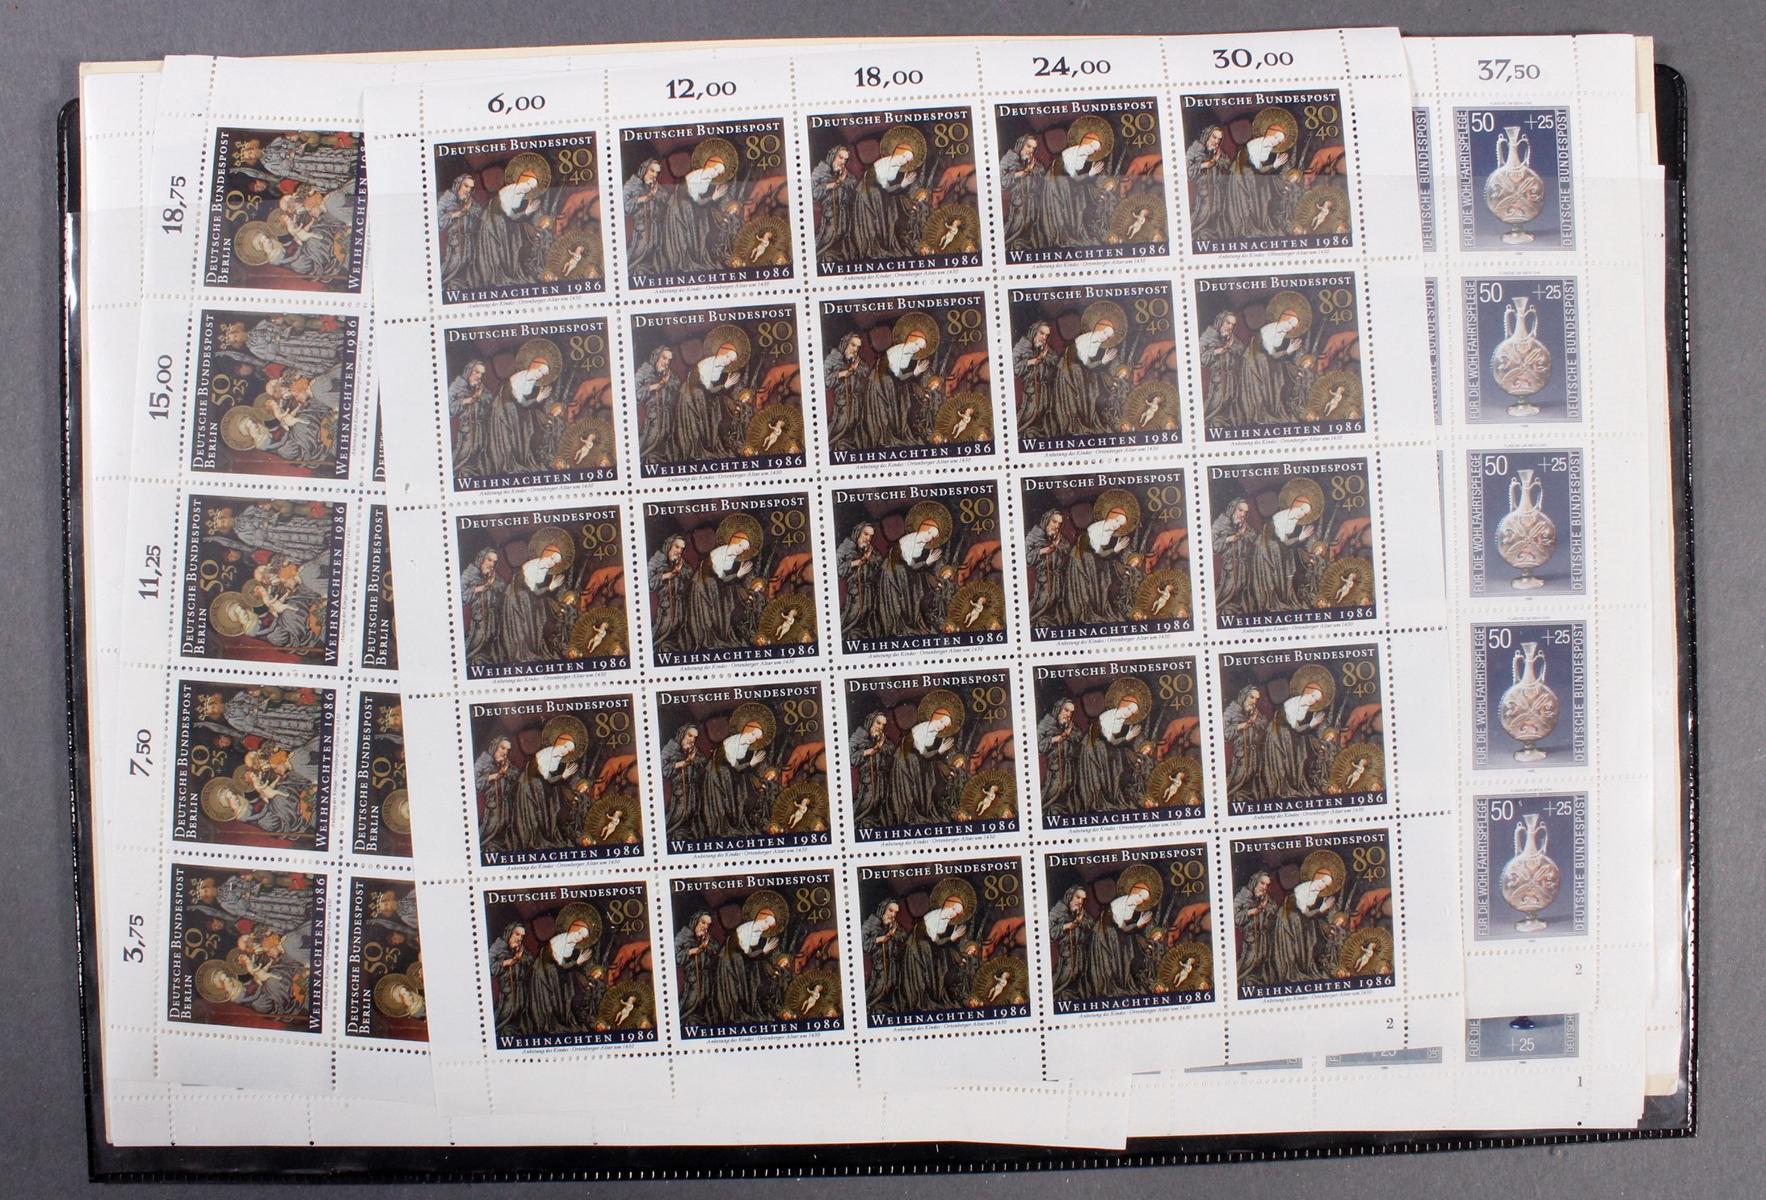 Kleines Briefmarkenalbum THE TRIUMPH STAMP ALBUM-3